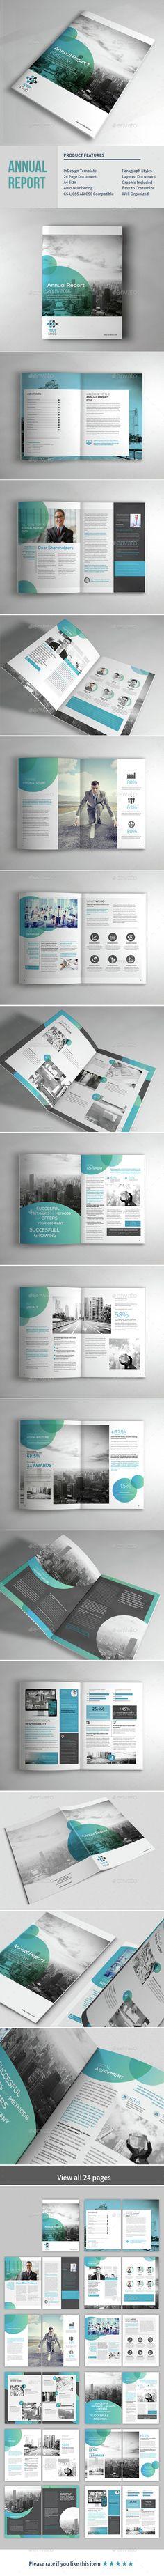 Business Brochure Template InDesign INDD. Download here: http://graphicriver.net/item/business-brochure/14947675?ref=ksioks